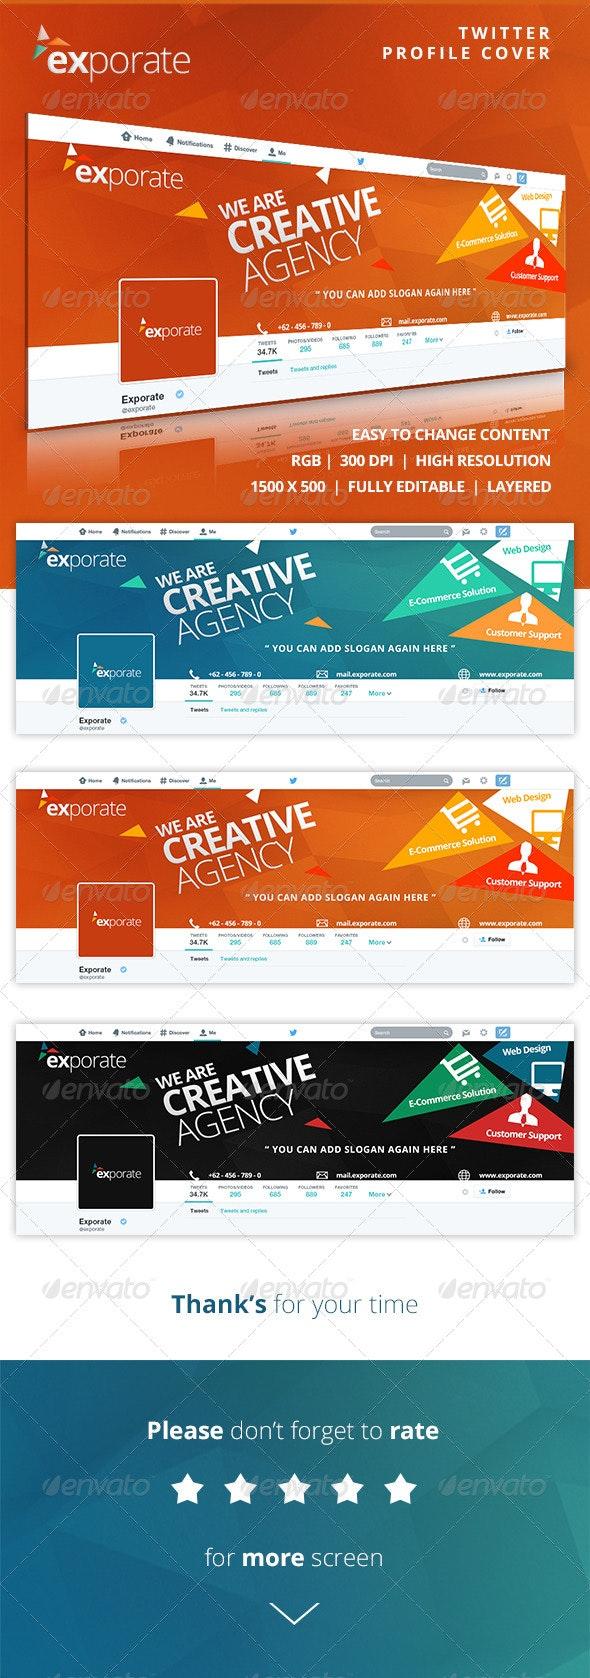 Exporate - Twitter Profile Cover - Twitter Social Media